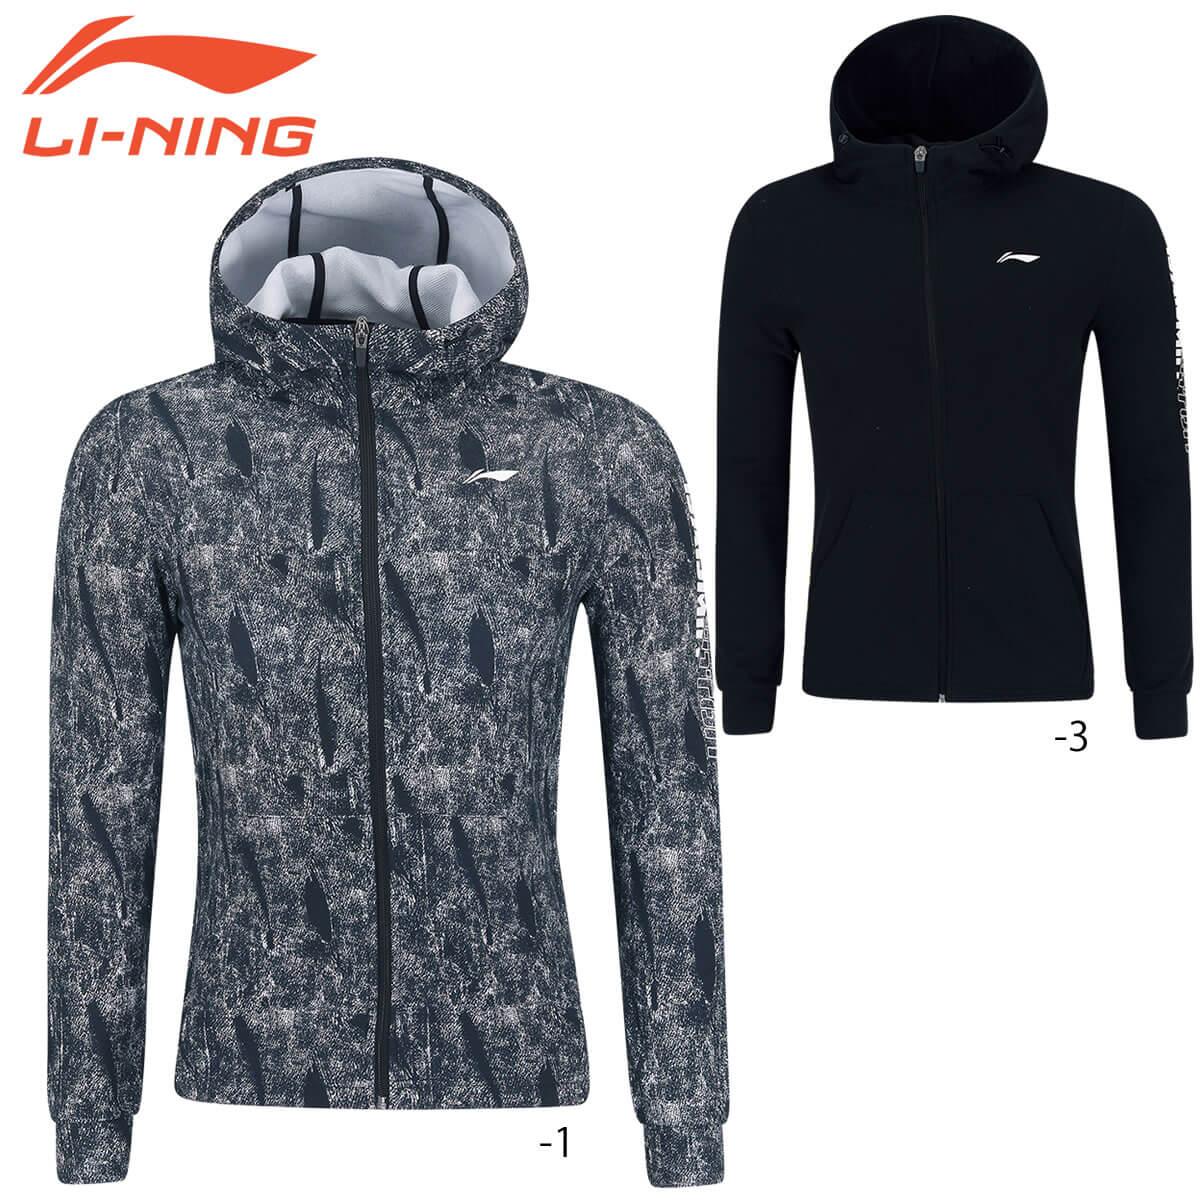 LI-NING AWDP582 ウォームアップジャケット(レディース) バドミントンウェア リーニン